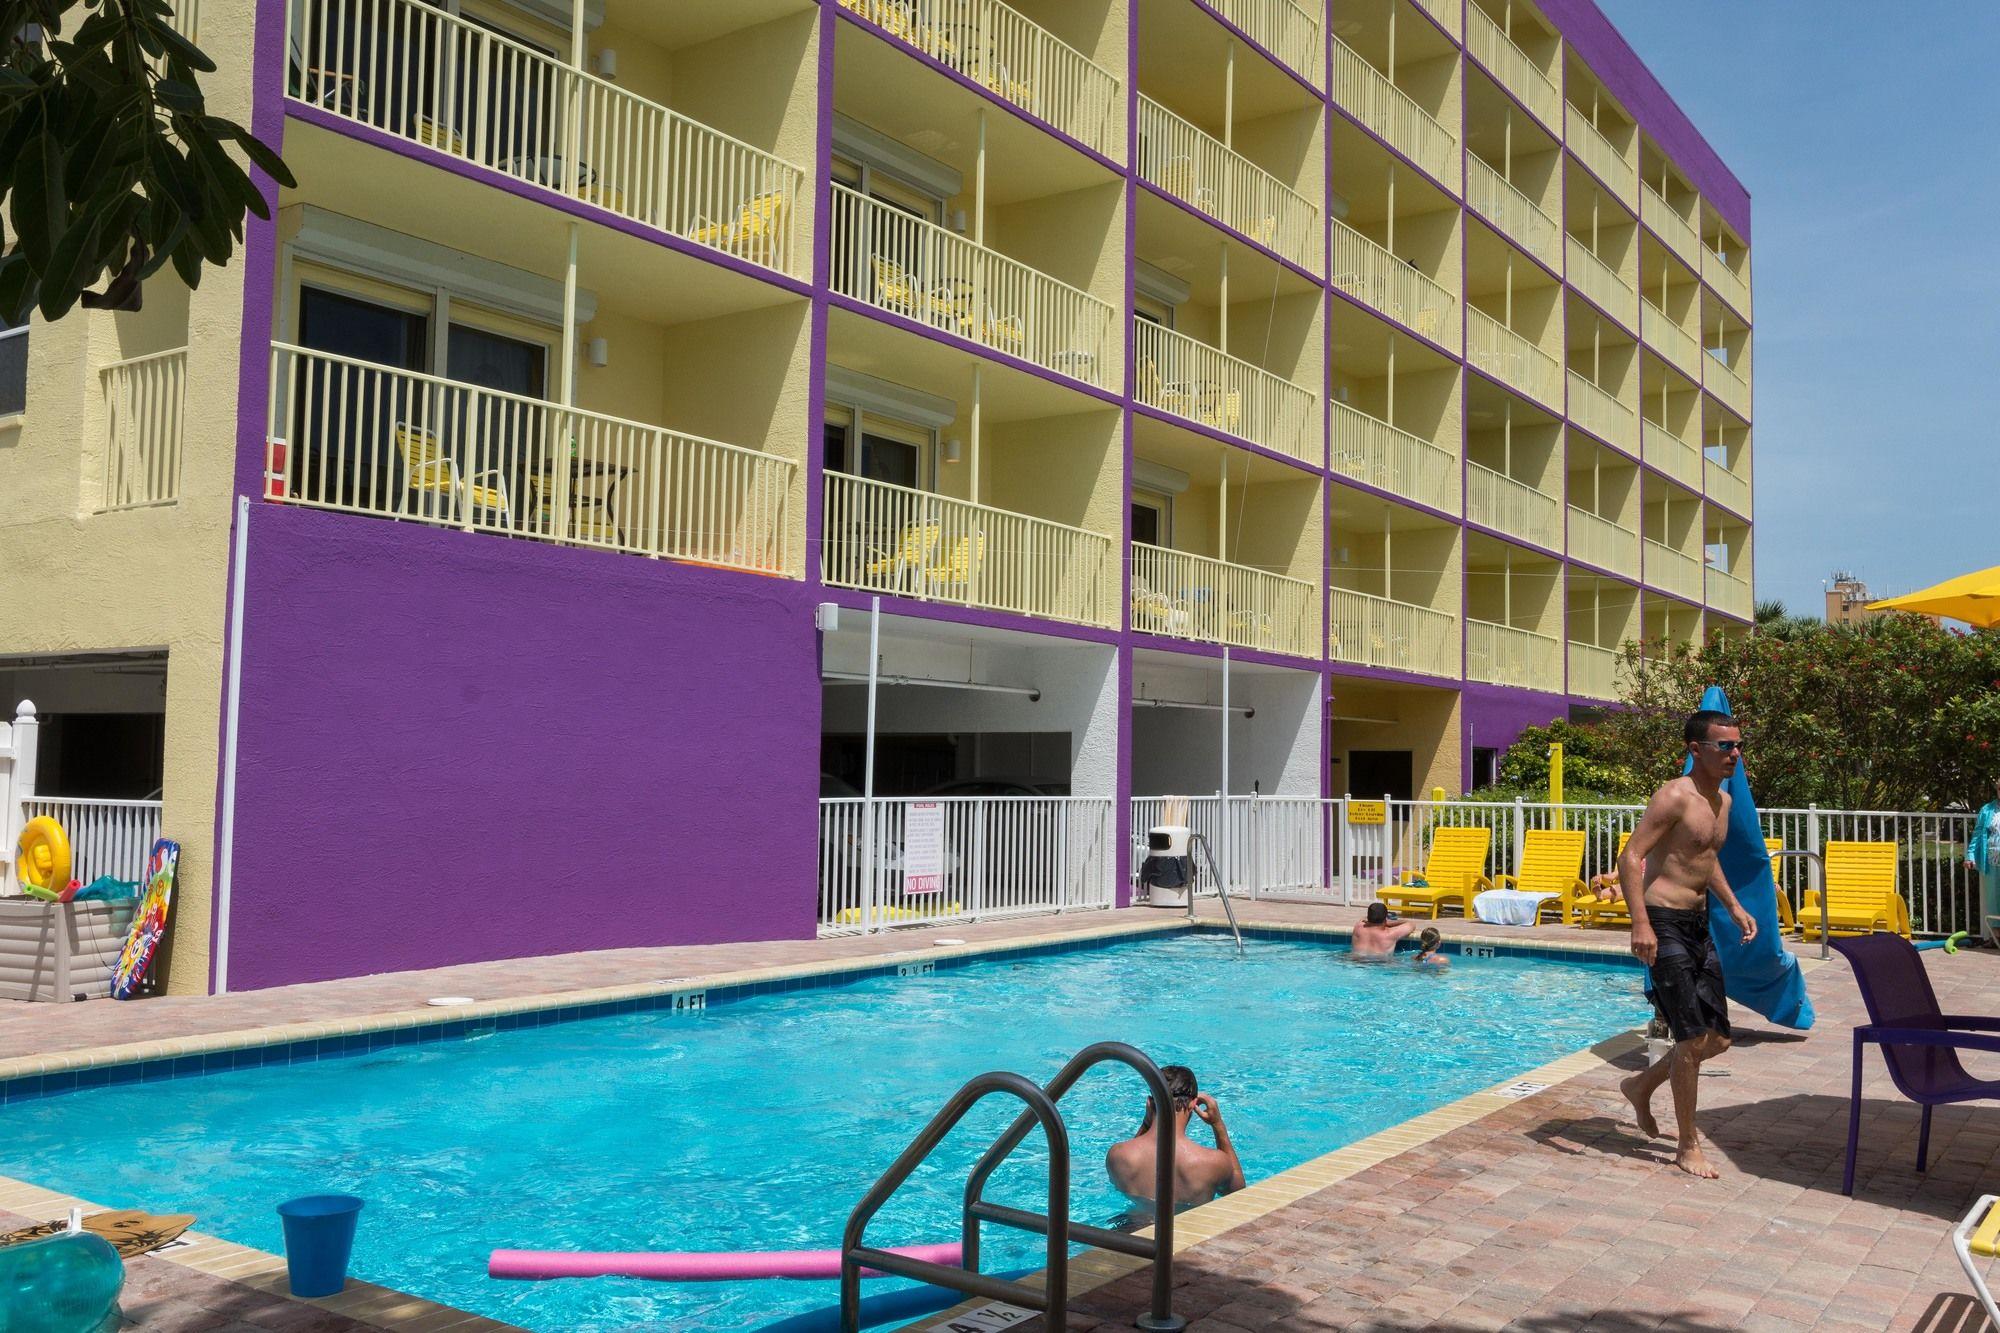 South Beach Condo Hotel